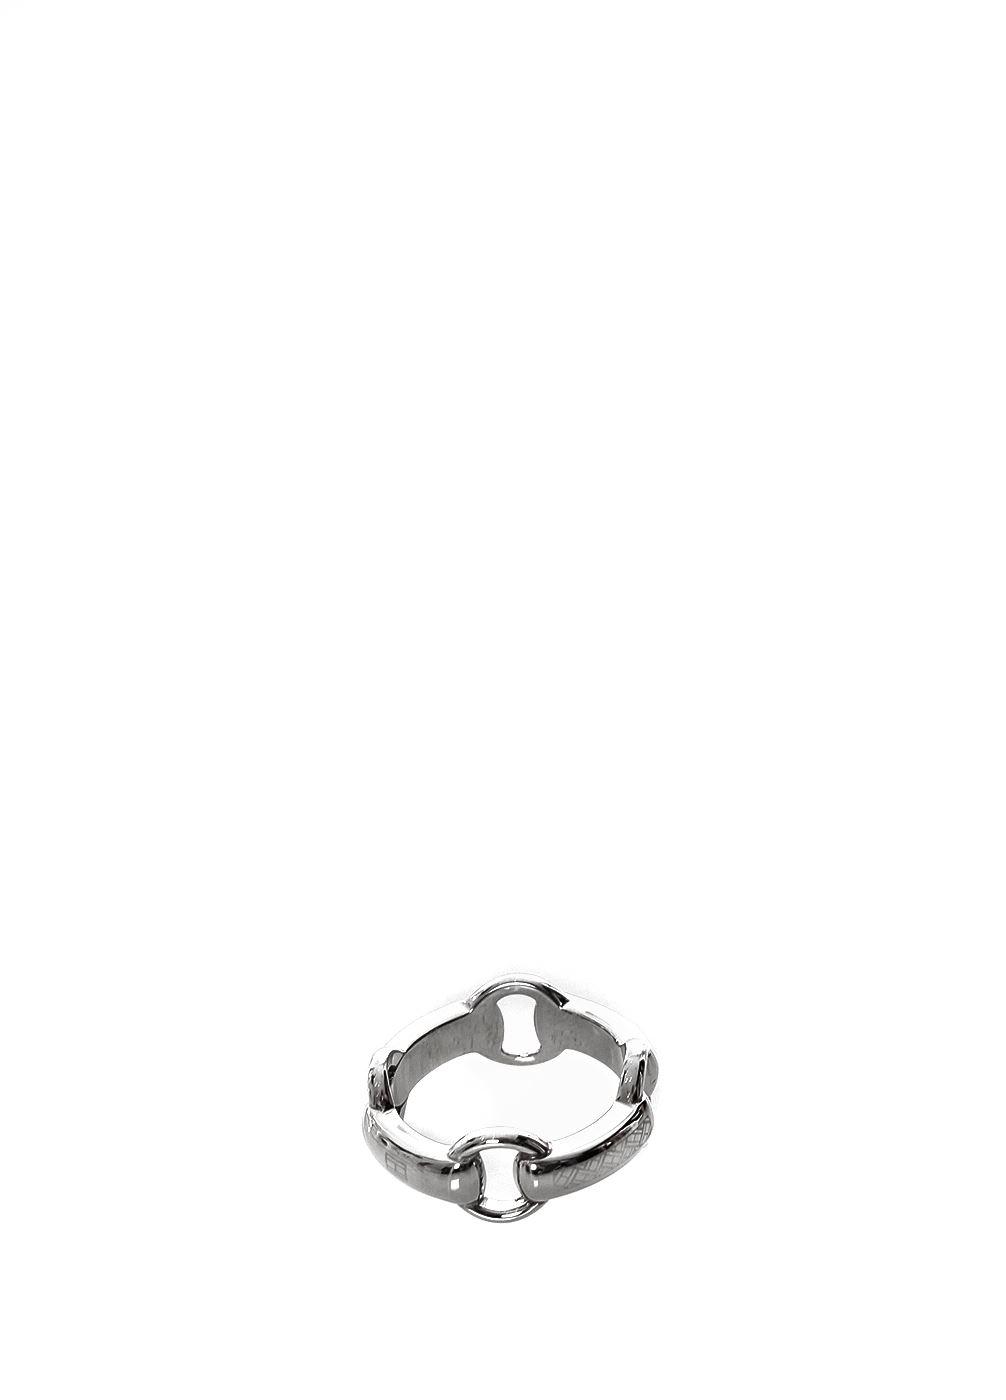 Tommy Hilfiger Accessories - Γυναικείο Δαχτυλίδι TOMMY HILFIGER